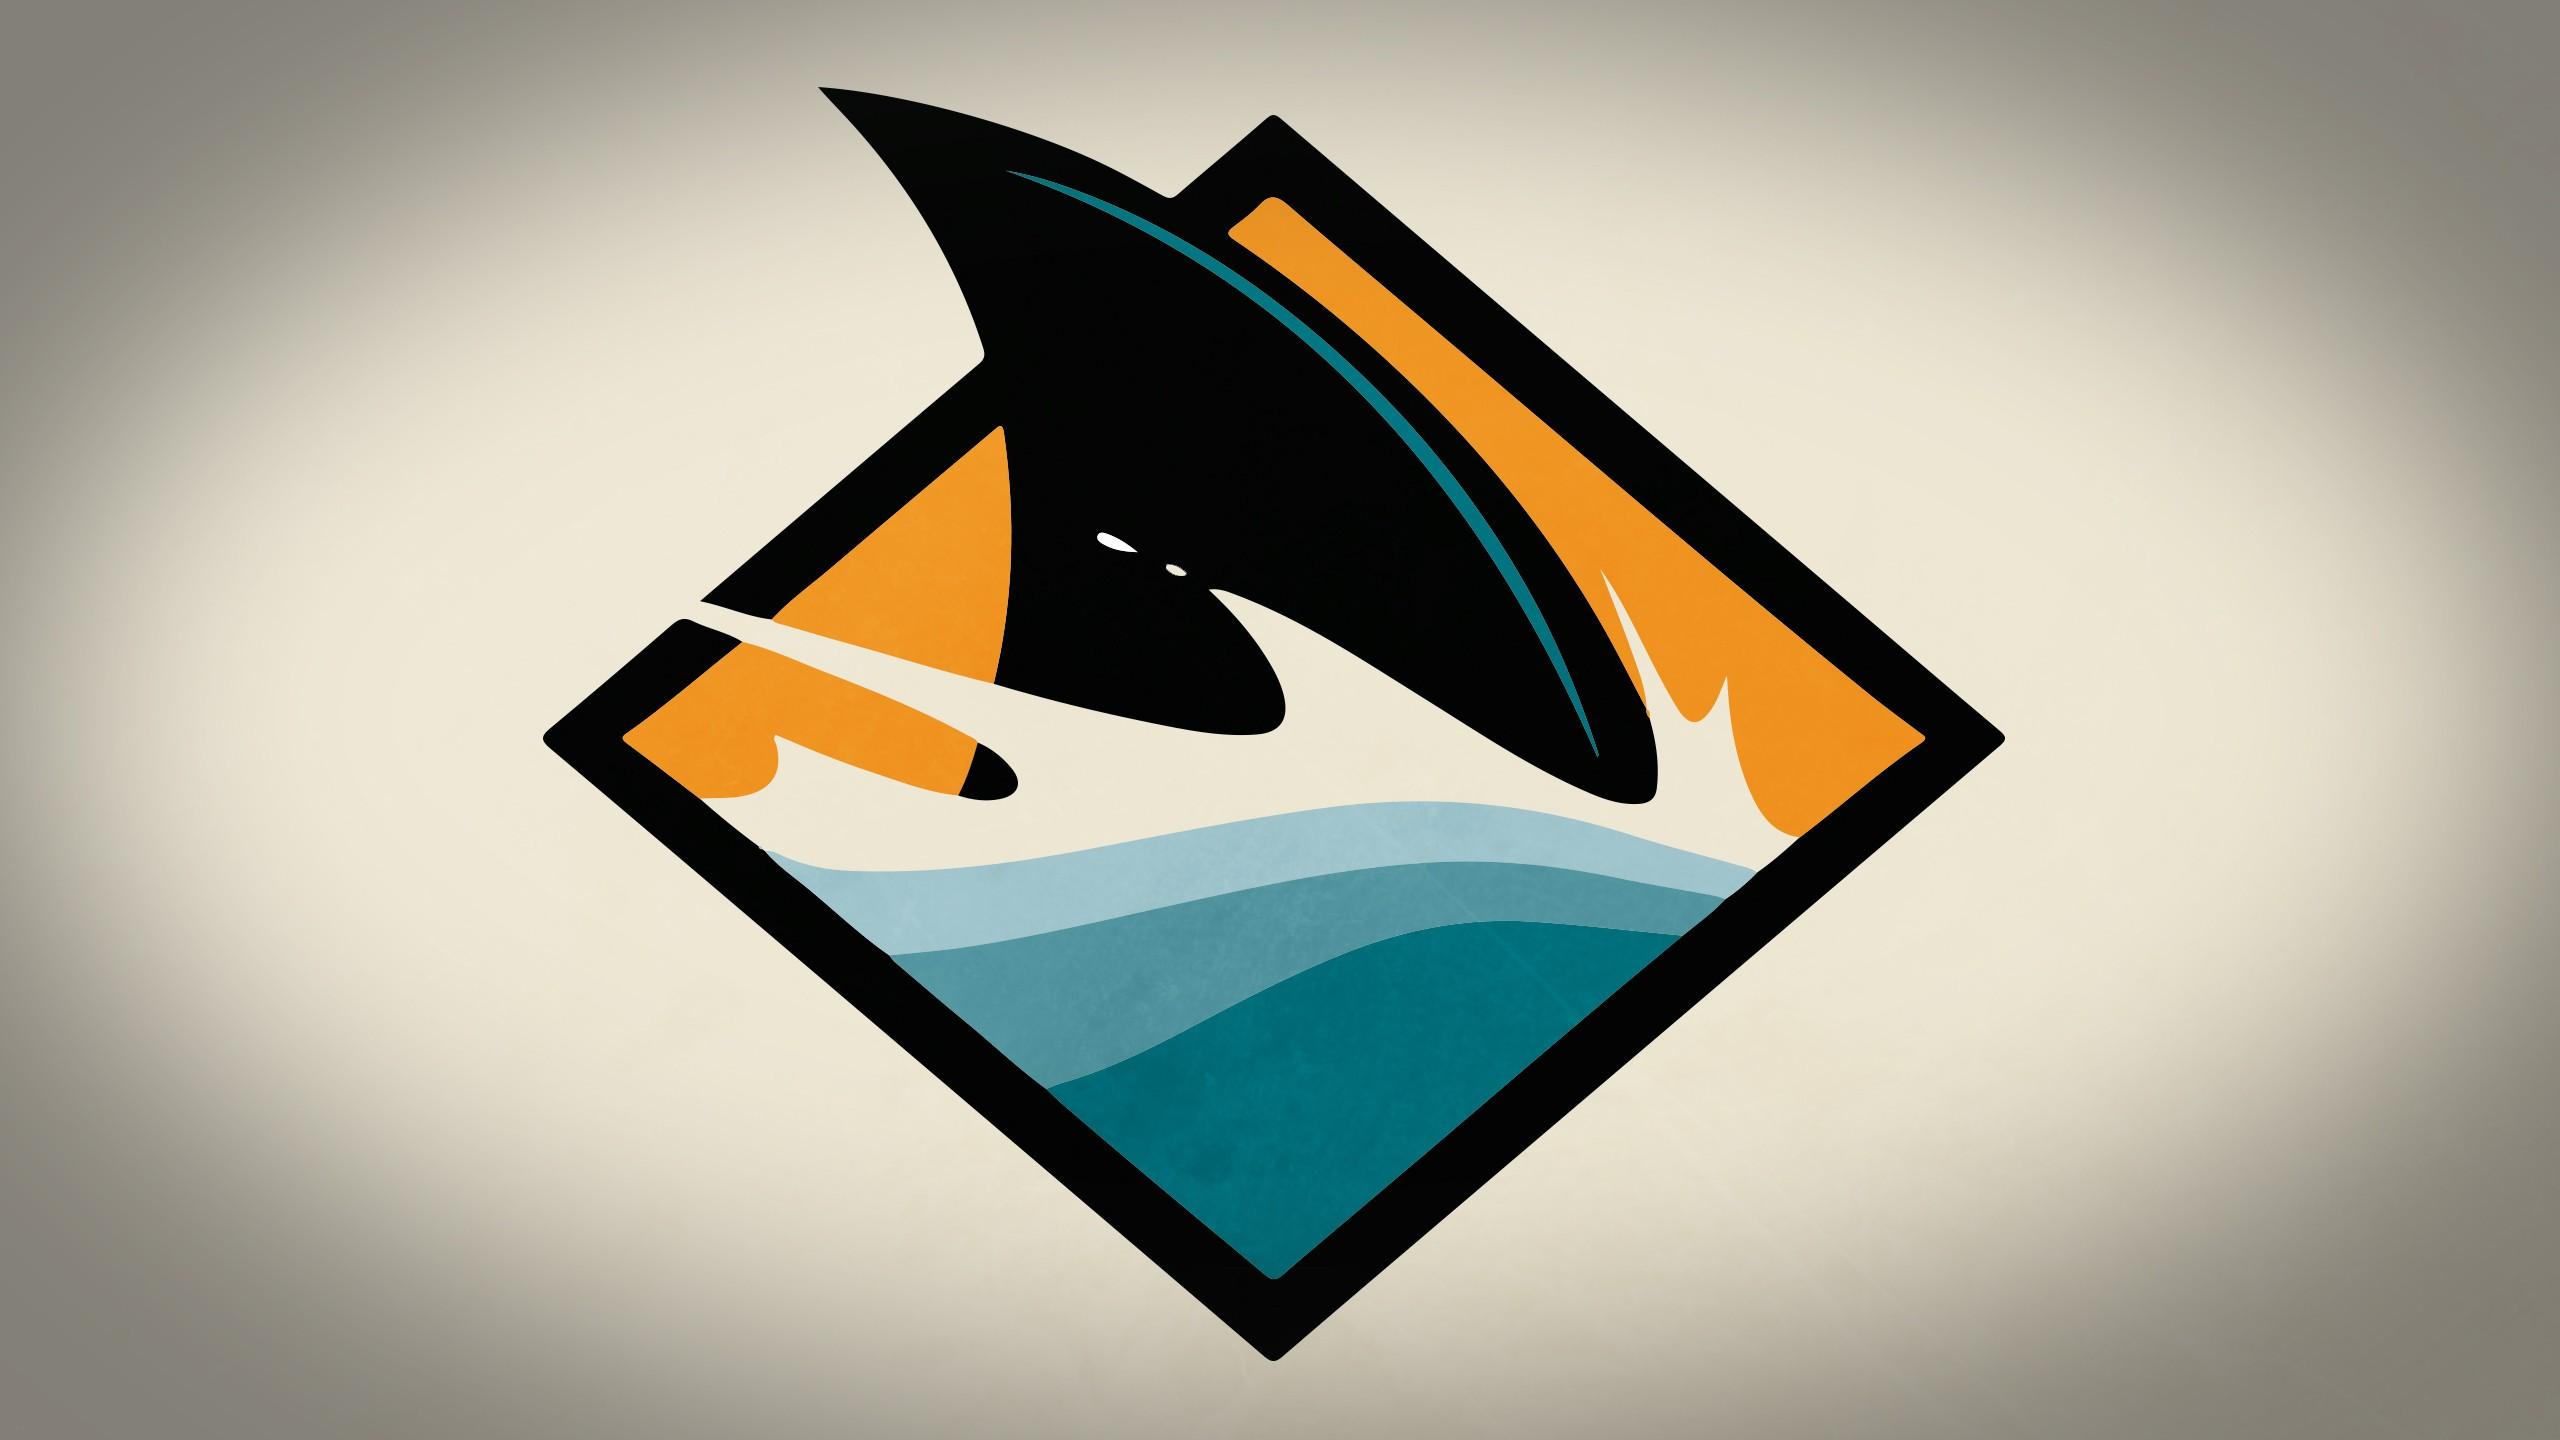 San Jose Sharks Computer Wallpapers, Desktop Backgrounds